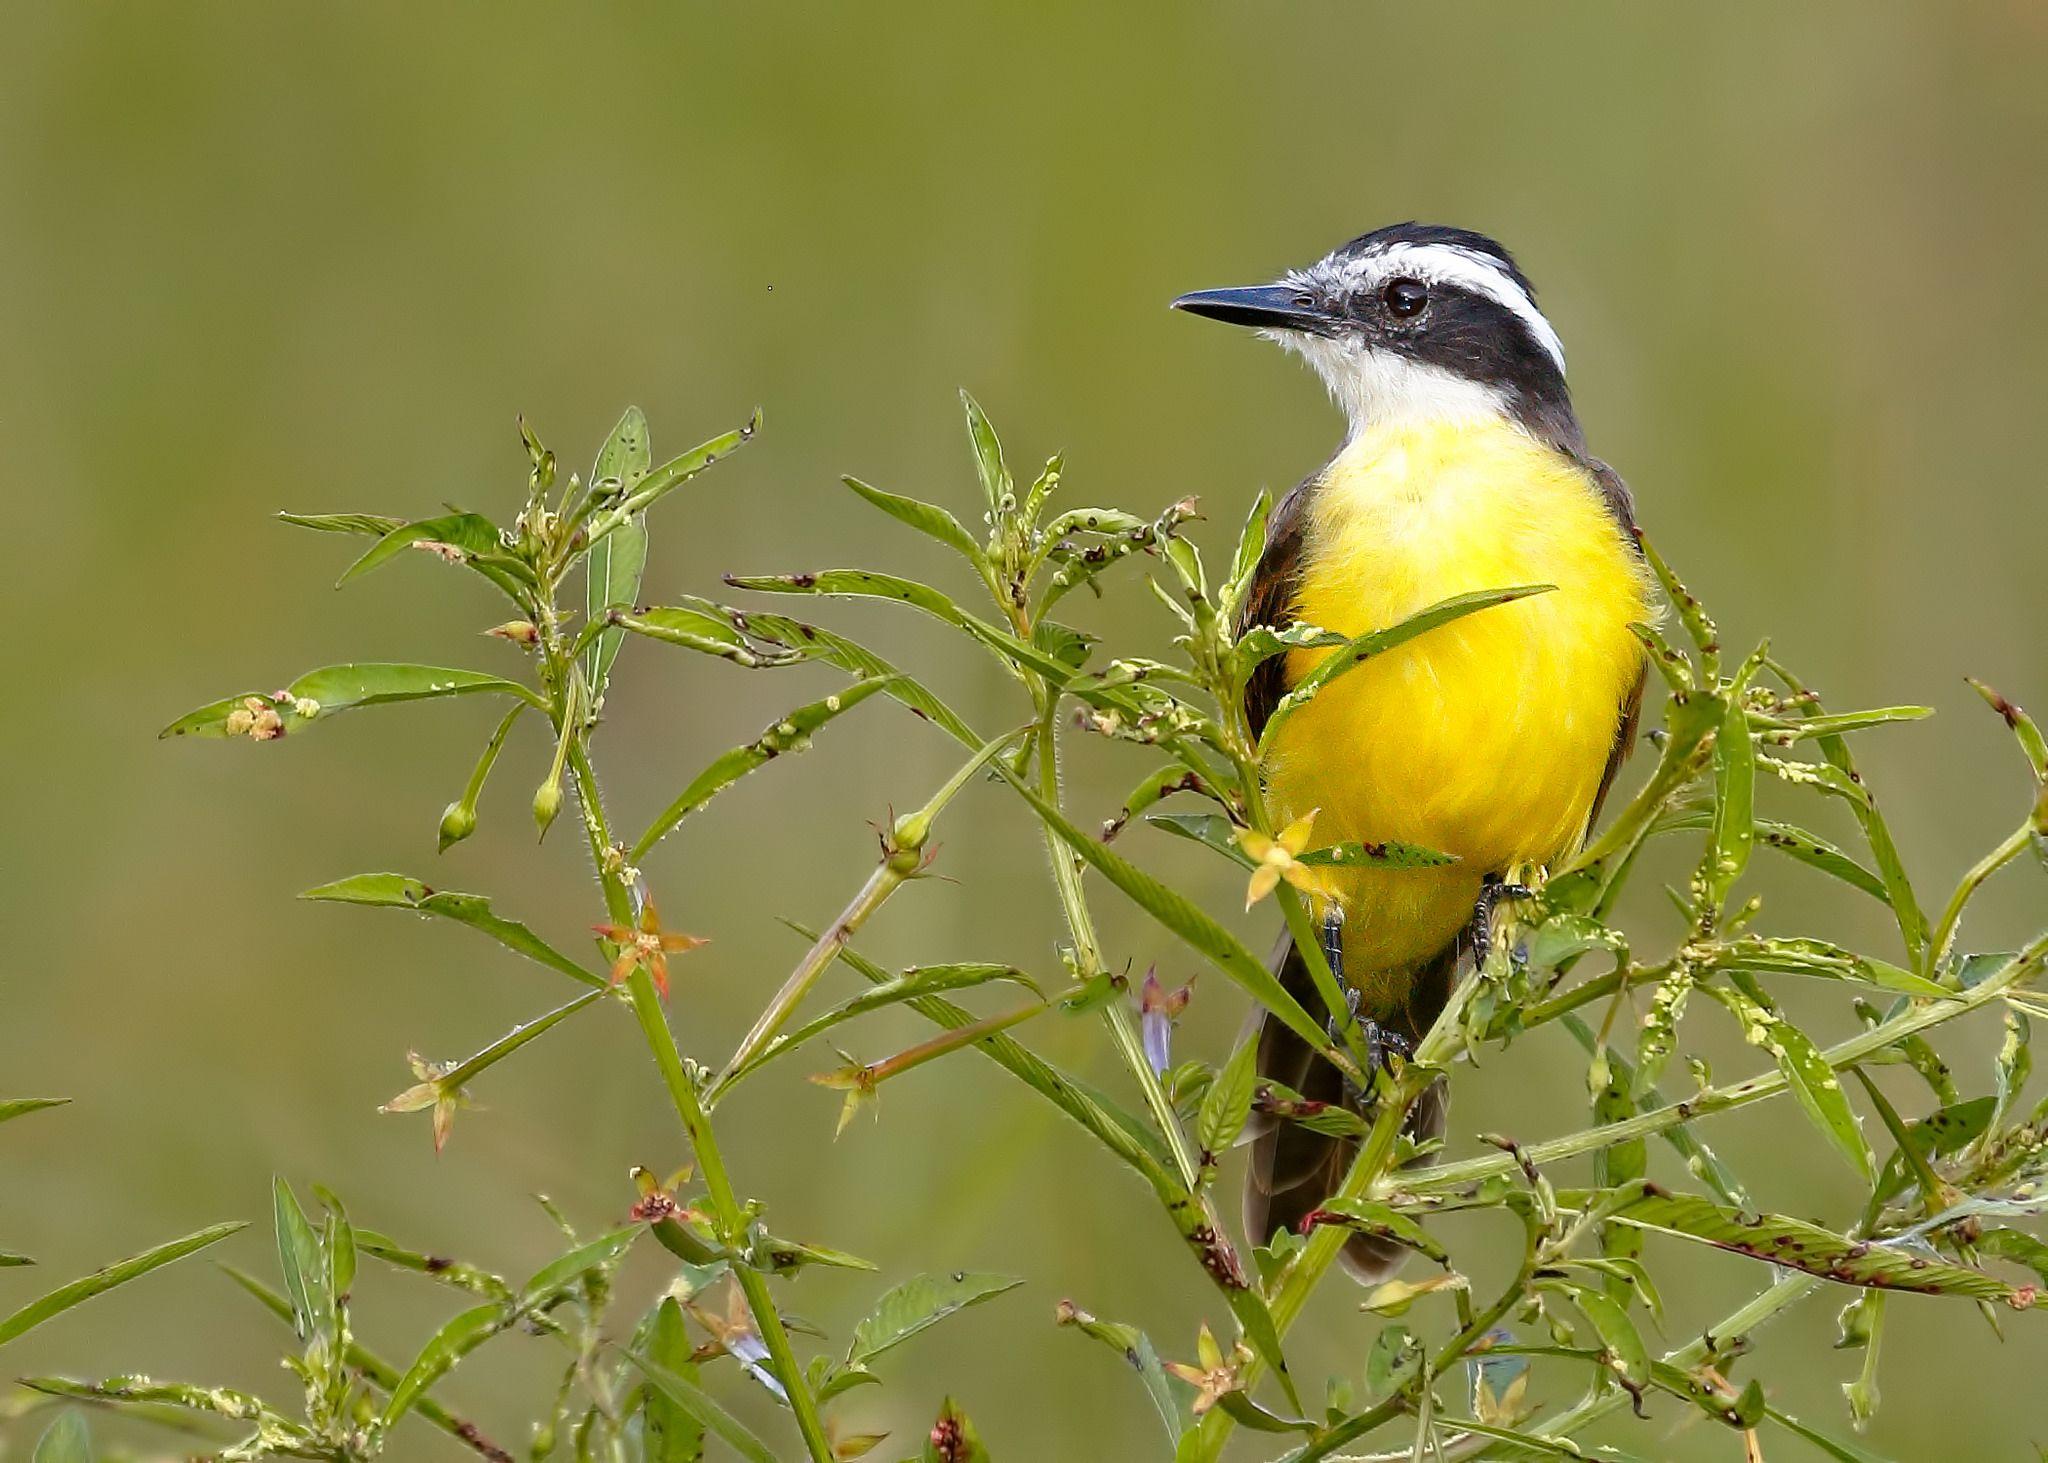 https://flic.kr/p/r34wih | lesser kiskadee | lesser kiskadee (Pitangus lictor), oxbow lakes, Madre de Dios, Peru 2014